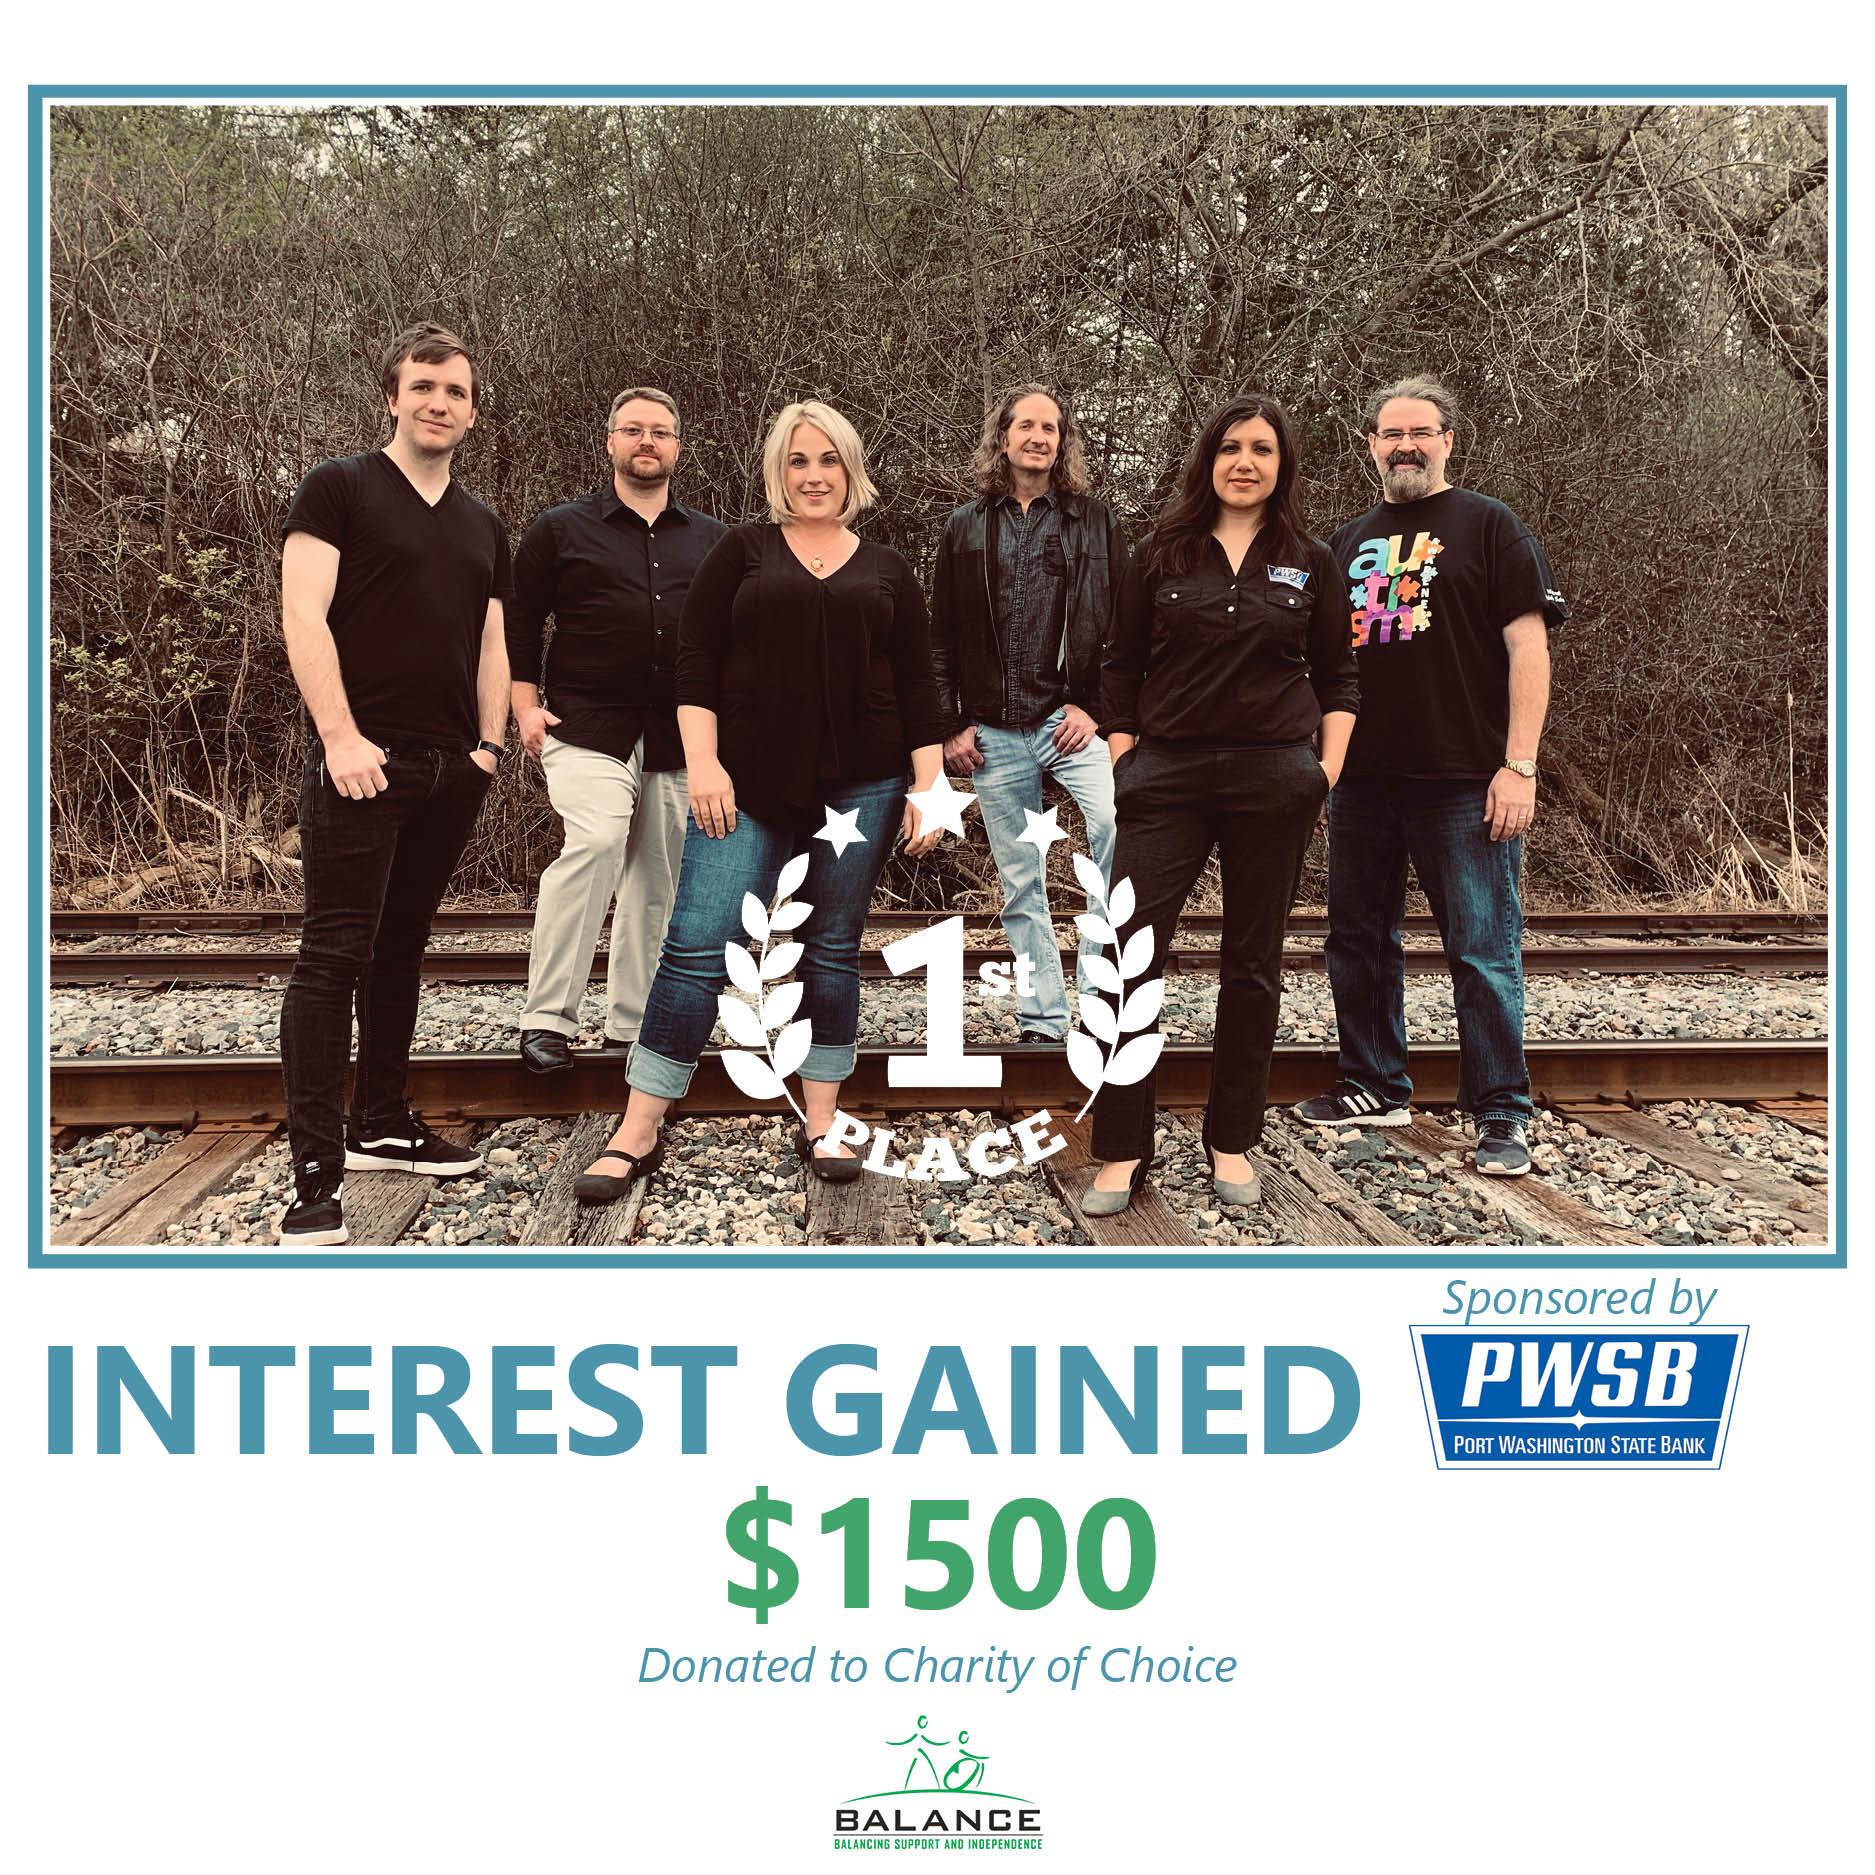 2019 BOTIB Winners_Interest Gained_GatheringontheGreen